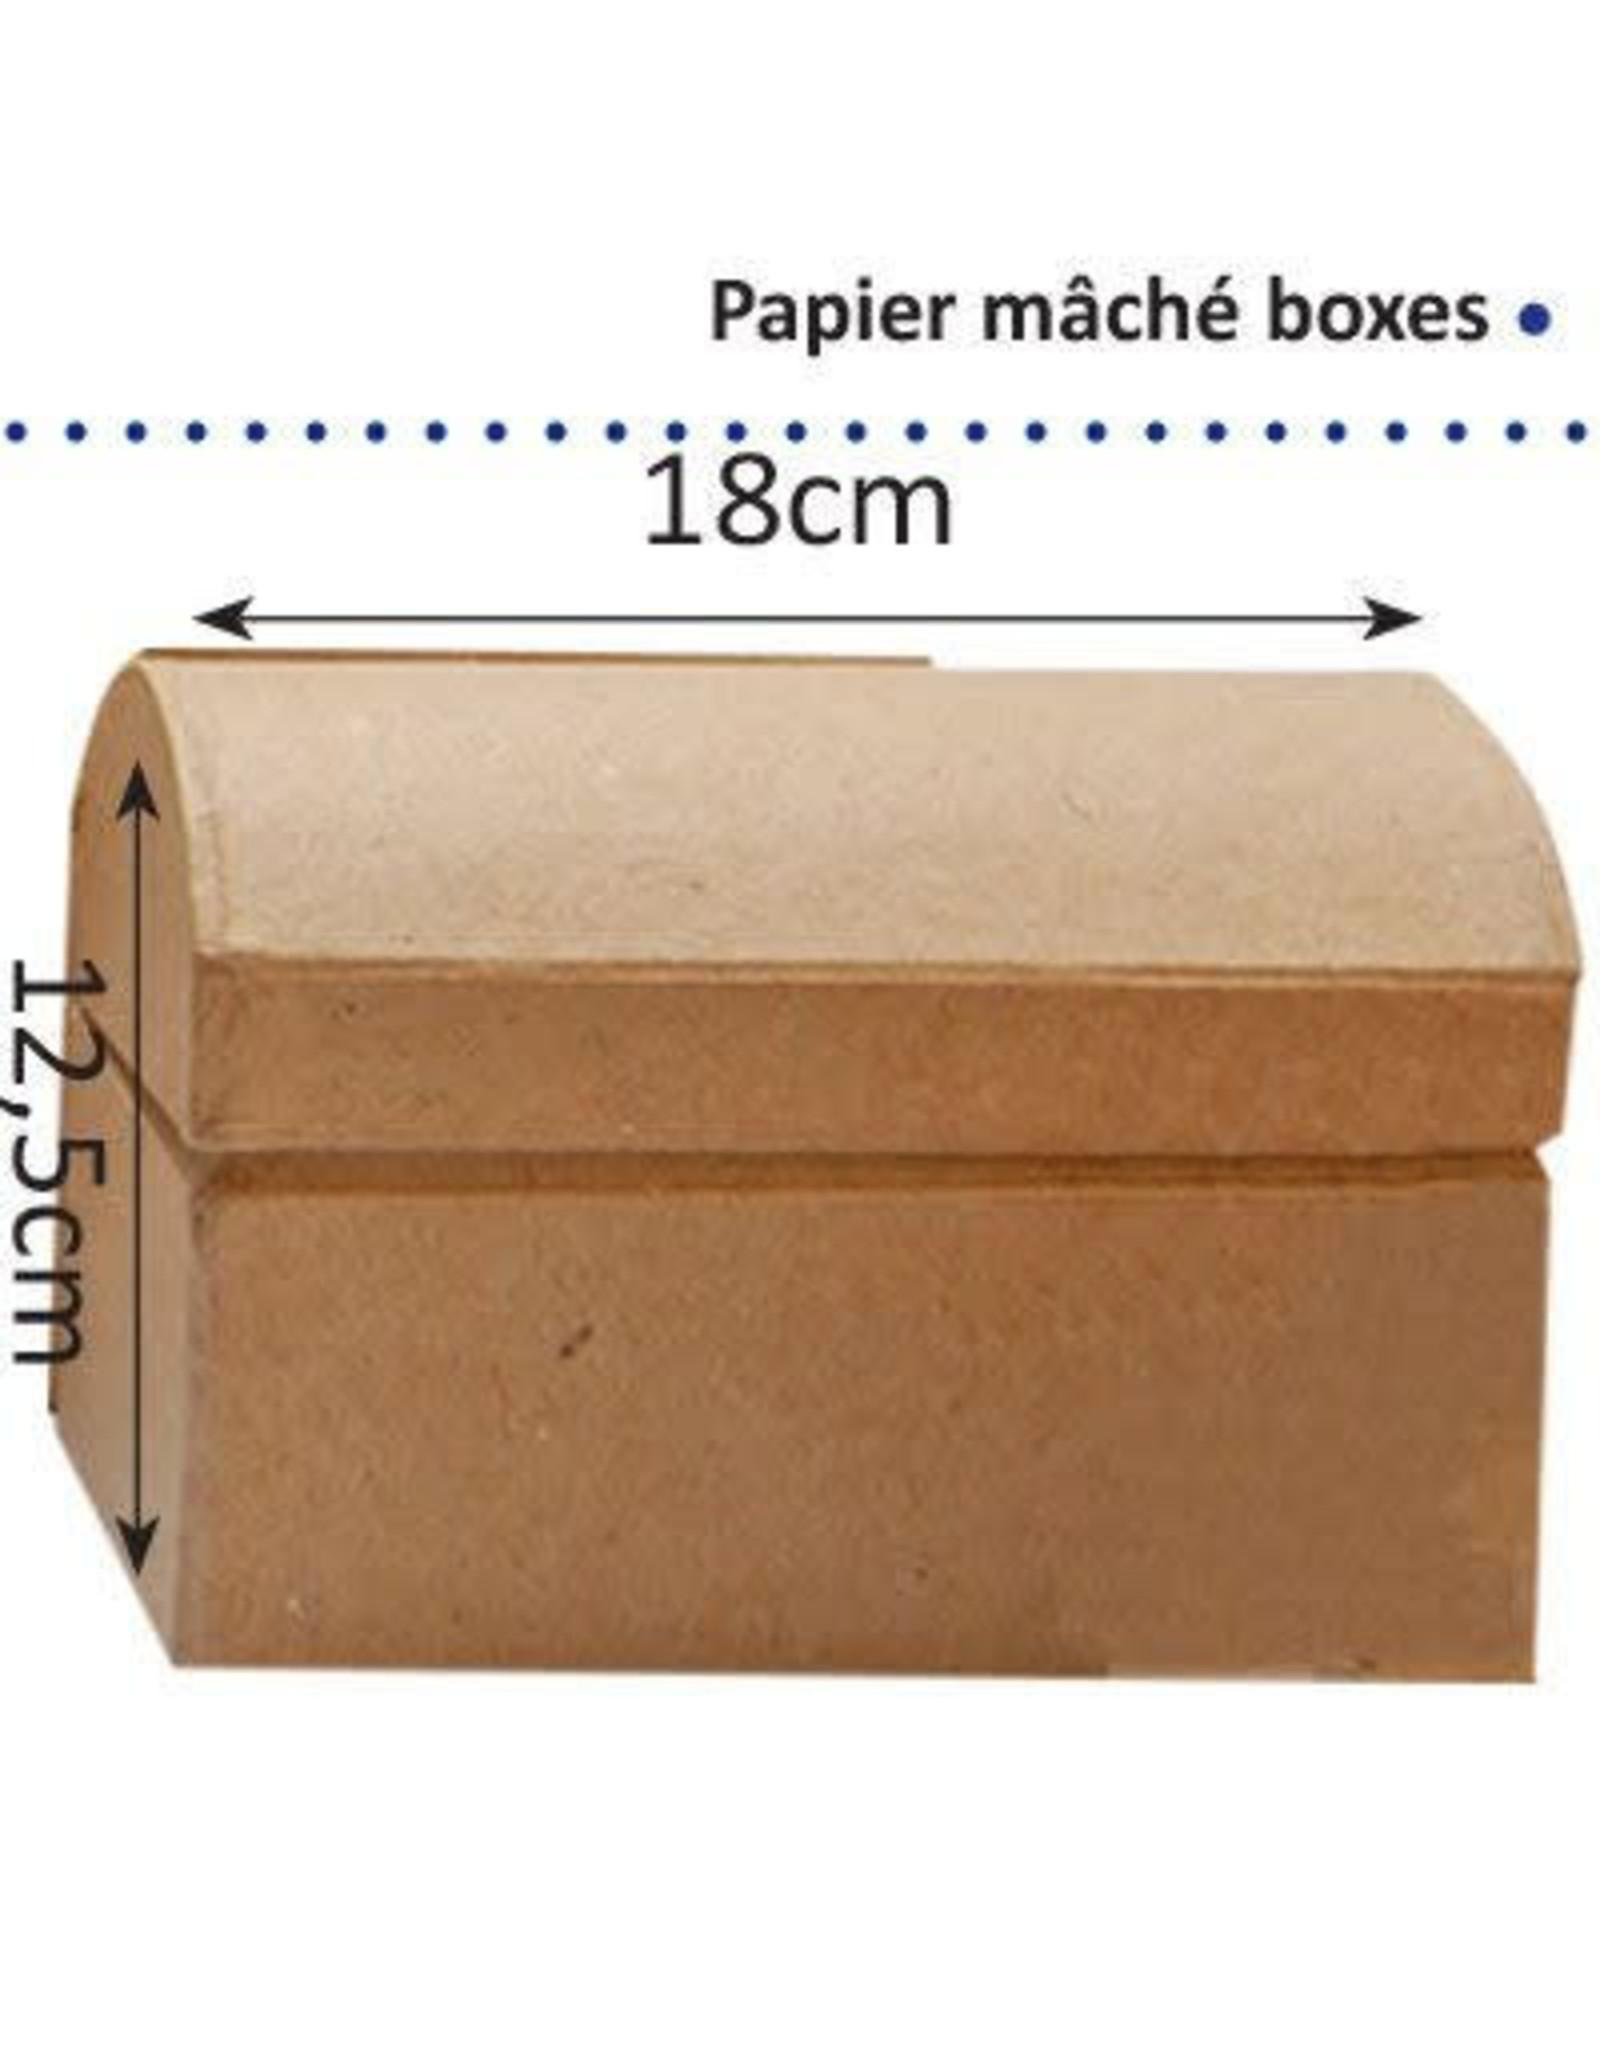 Vaessen Creative Papier maché schatkist 18cm